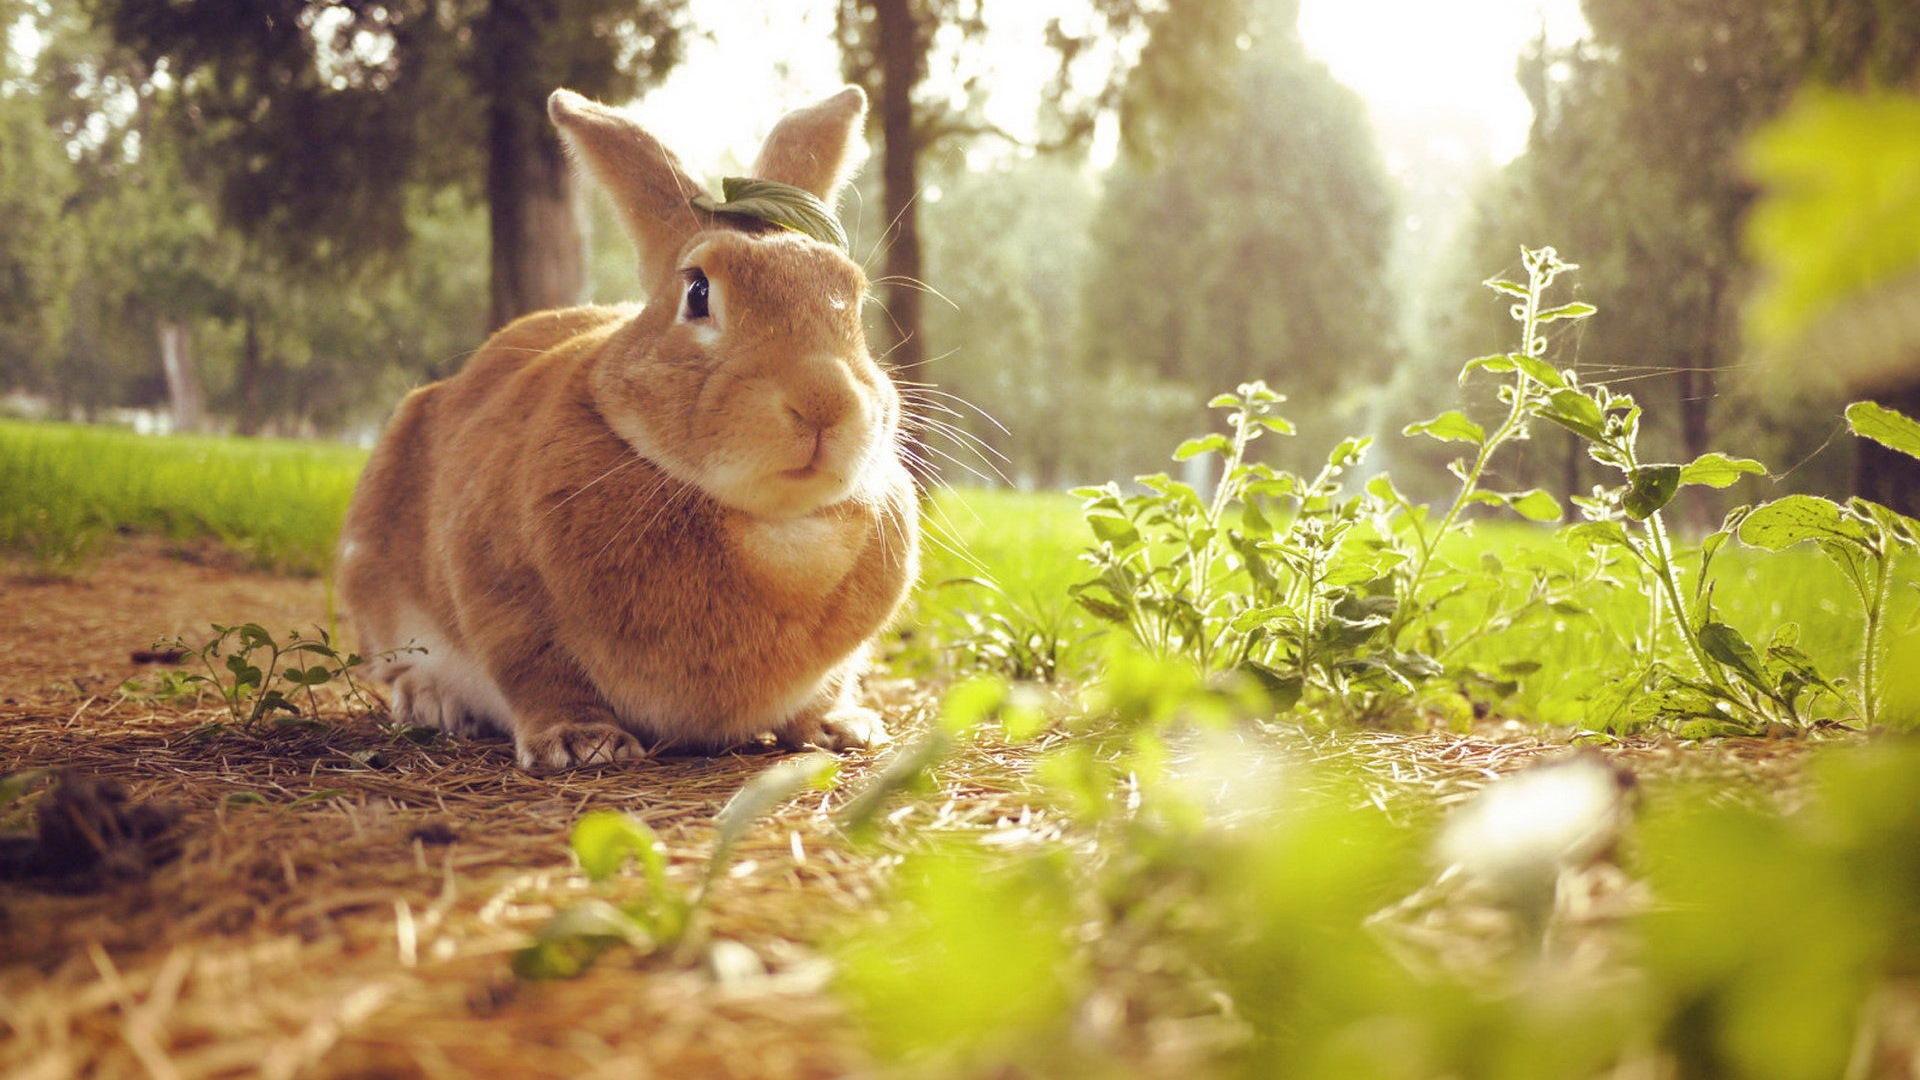 Animaux fourrure mignon fonds d 39 cran lapin hd 13 for Fond ecran animaux hd